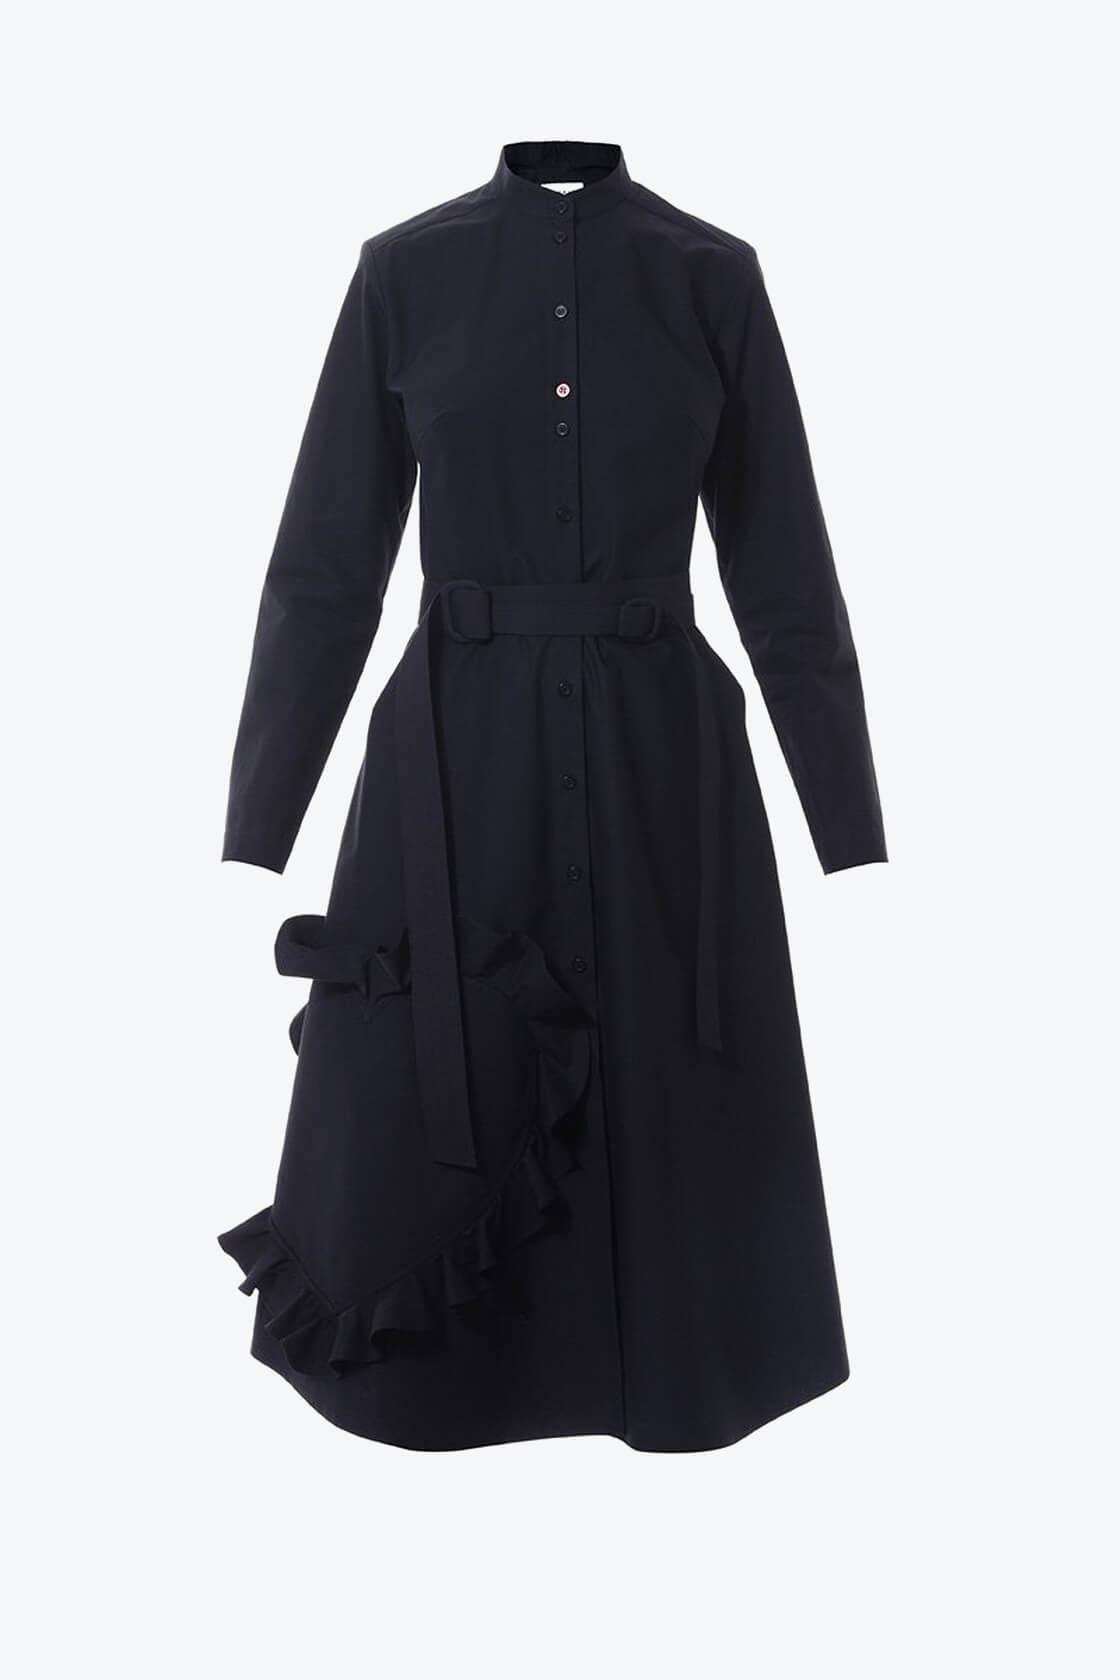 OL10000217 Mandarin collar shirtdress with ruffle heart aplique black1